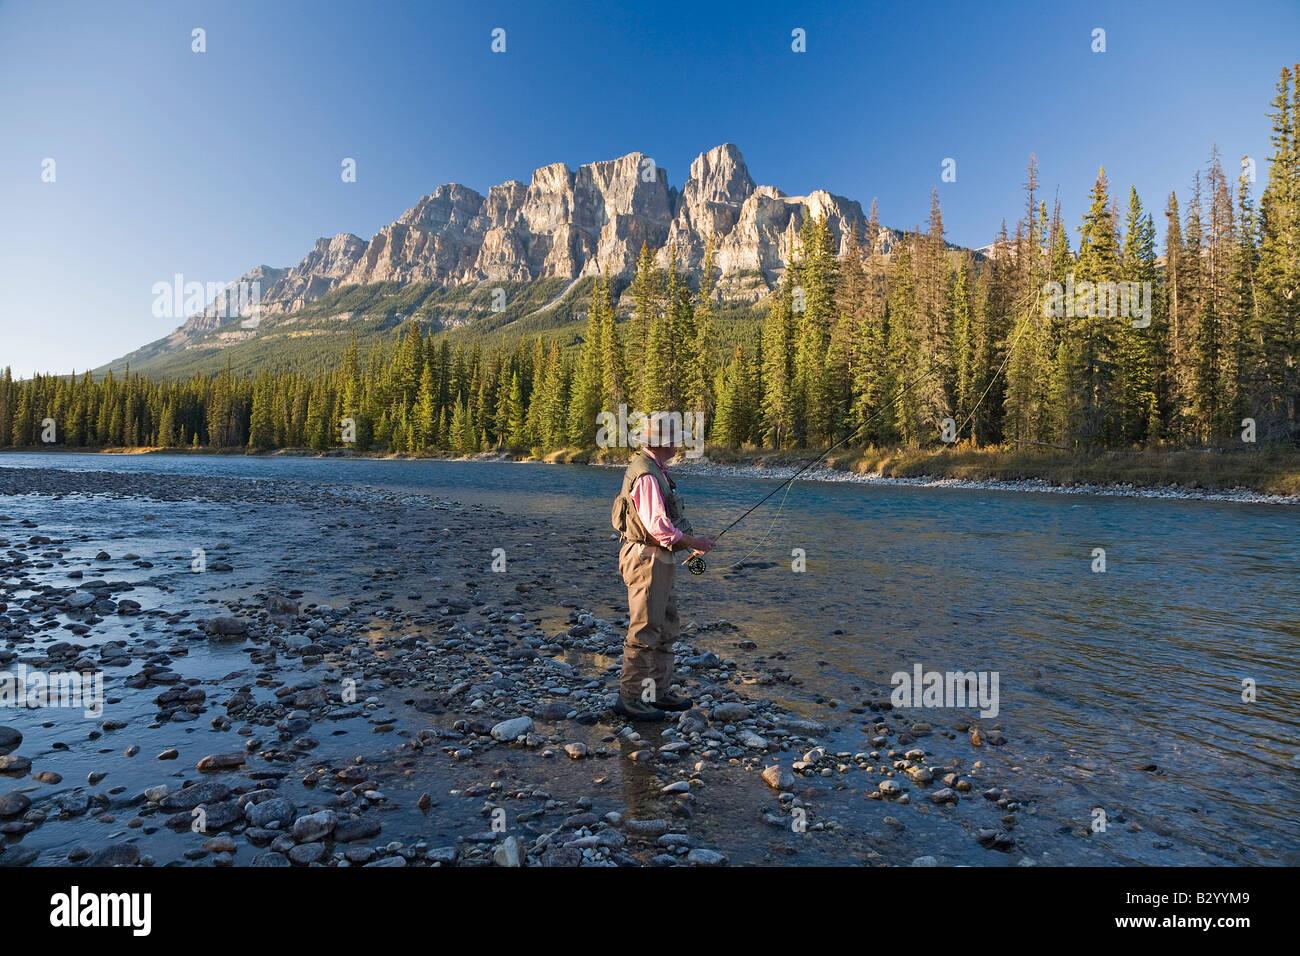 Man Fishing in Mountain River, Banff National Park, Alberta, Canada Stock Photo